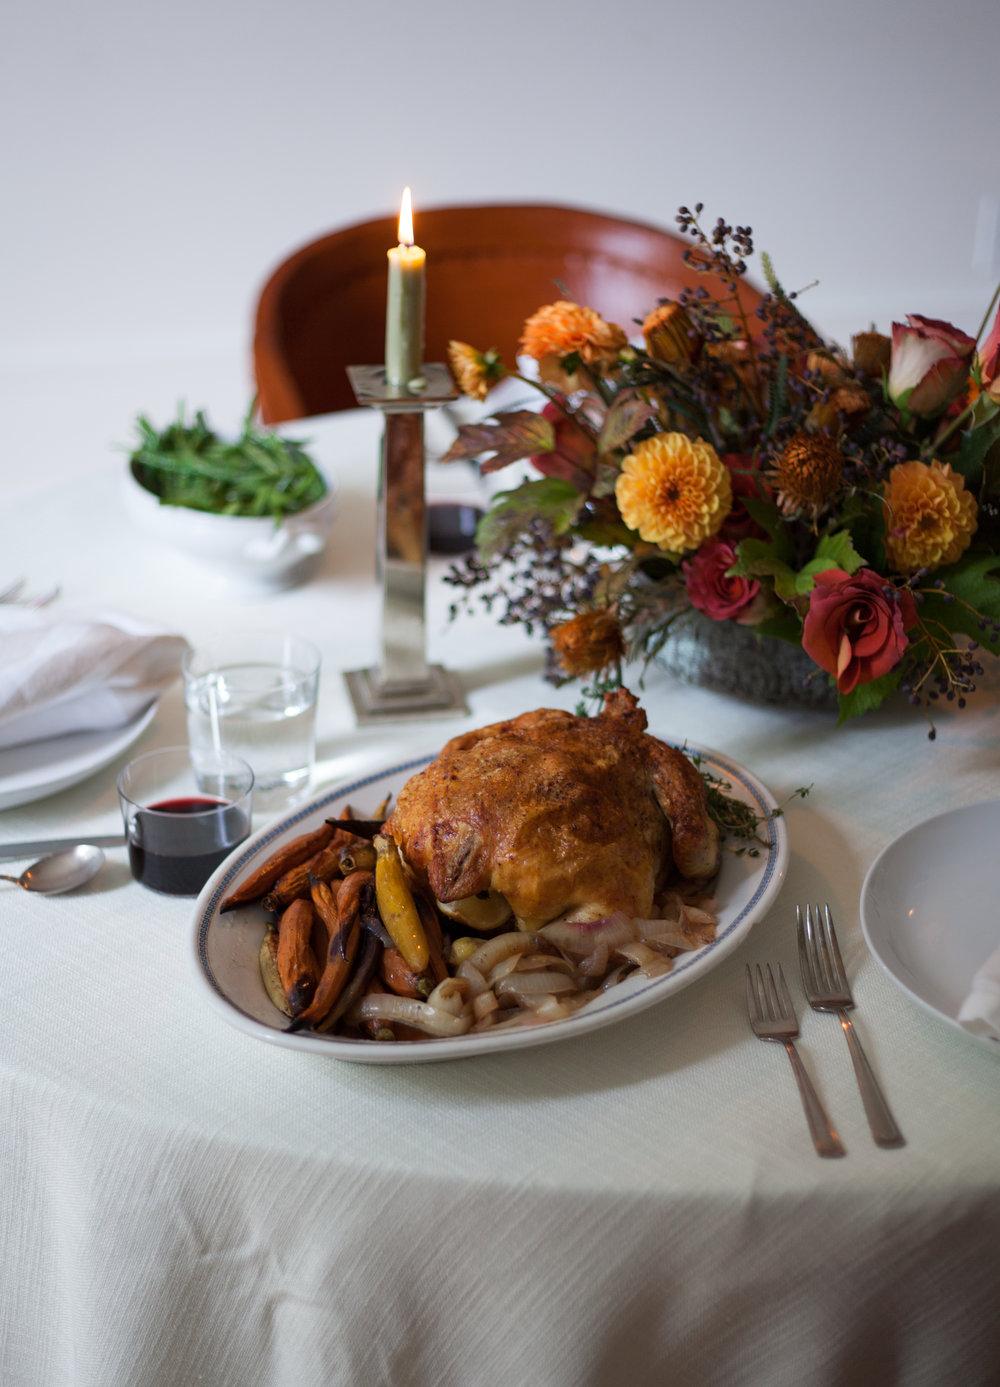 12th-Table-WEDDING-RENTALS-NASHVILLE-Design-Tips-Hosting-ENTERTAINING-Series-HowIHost-Jason-Arnold-Interiors-Carl-Denton-Events-DinnerParty-103.jpg